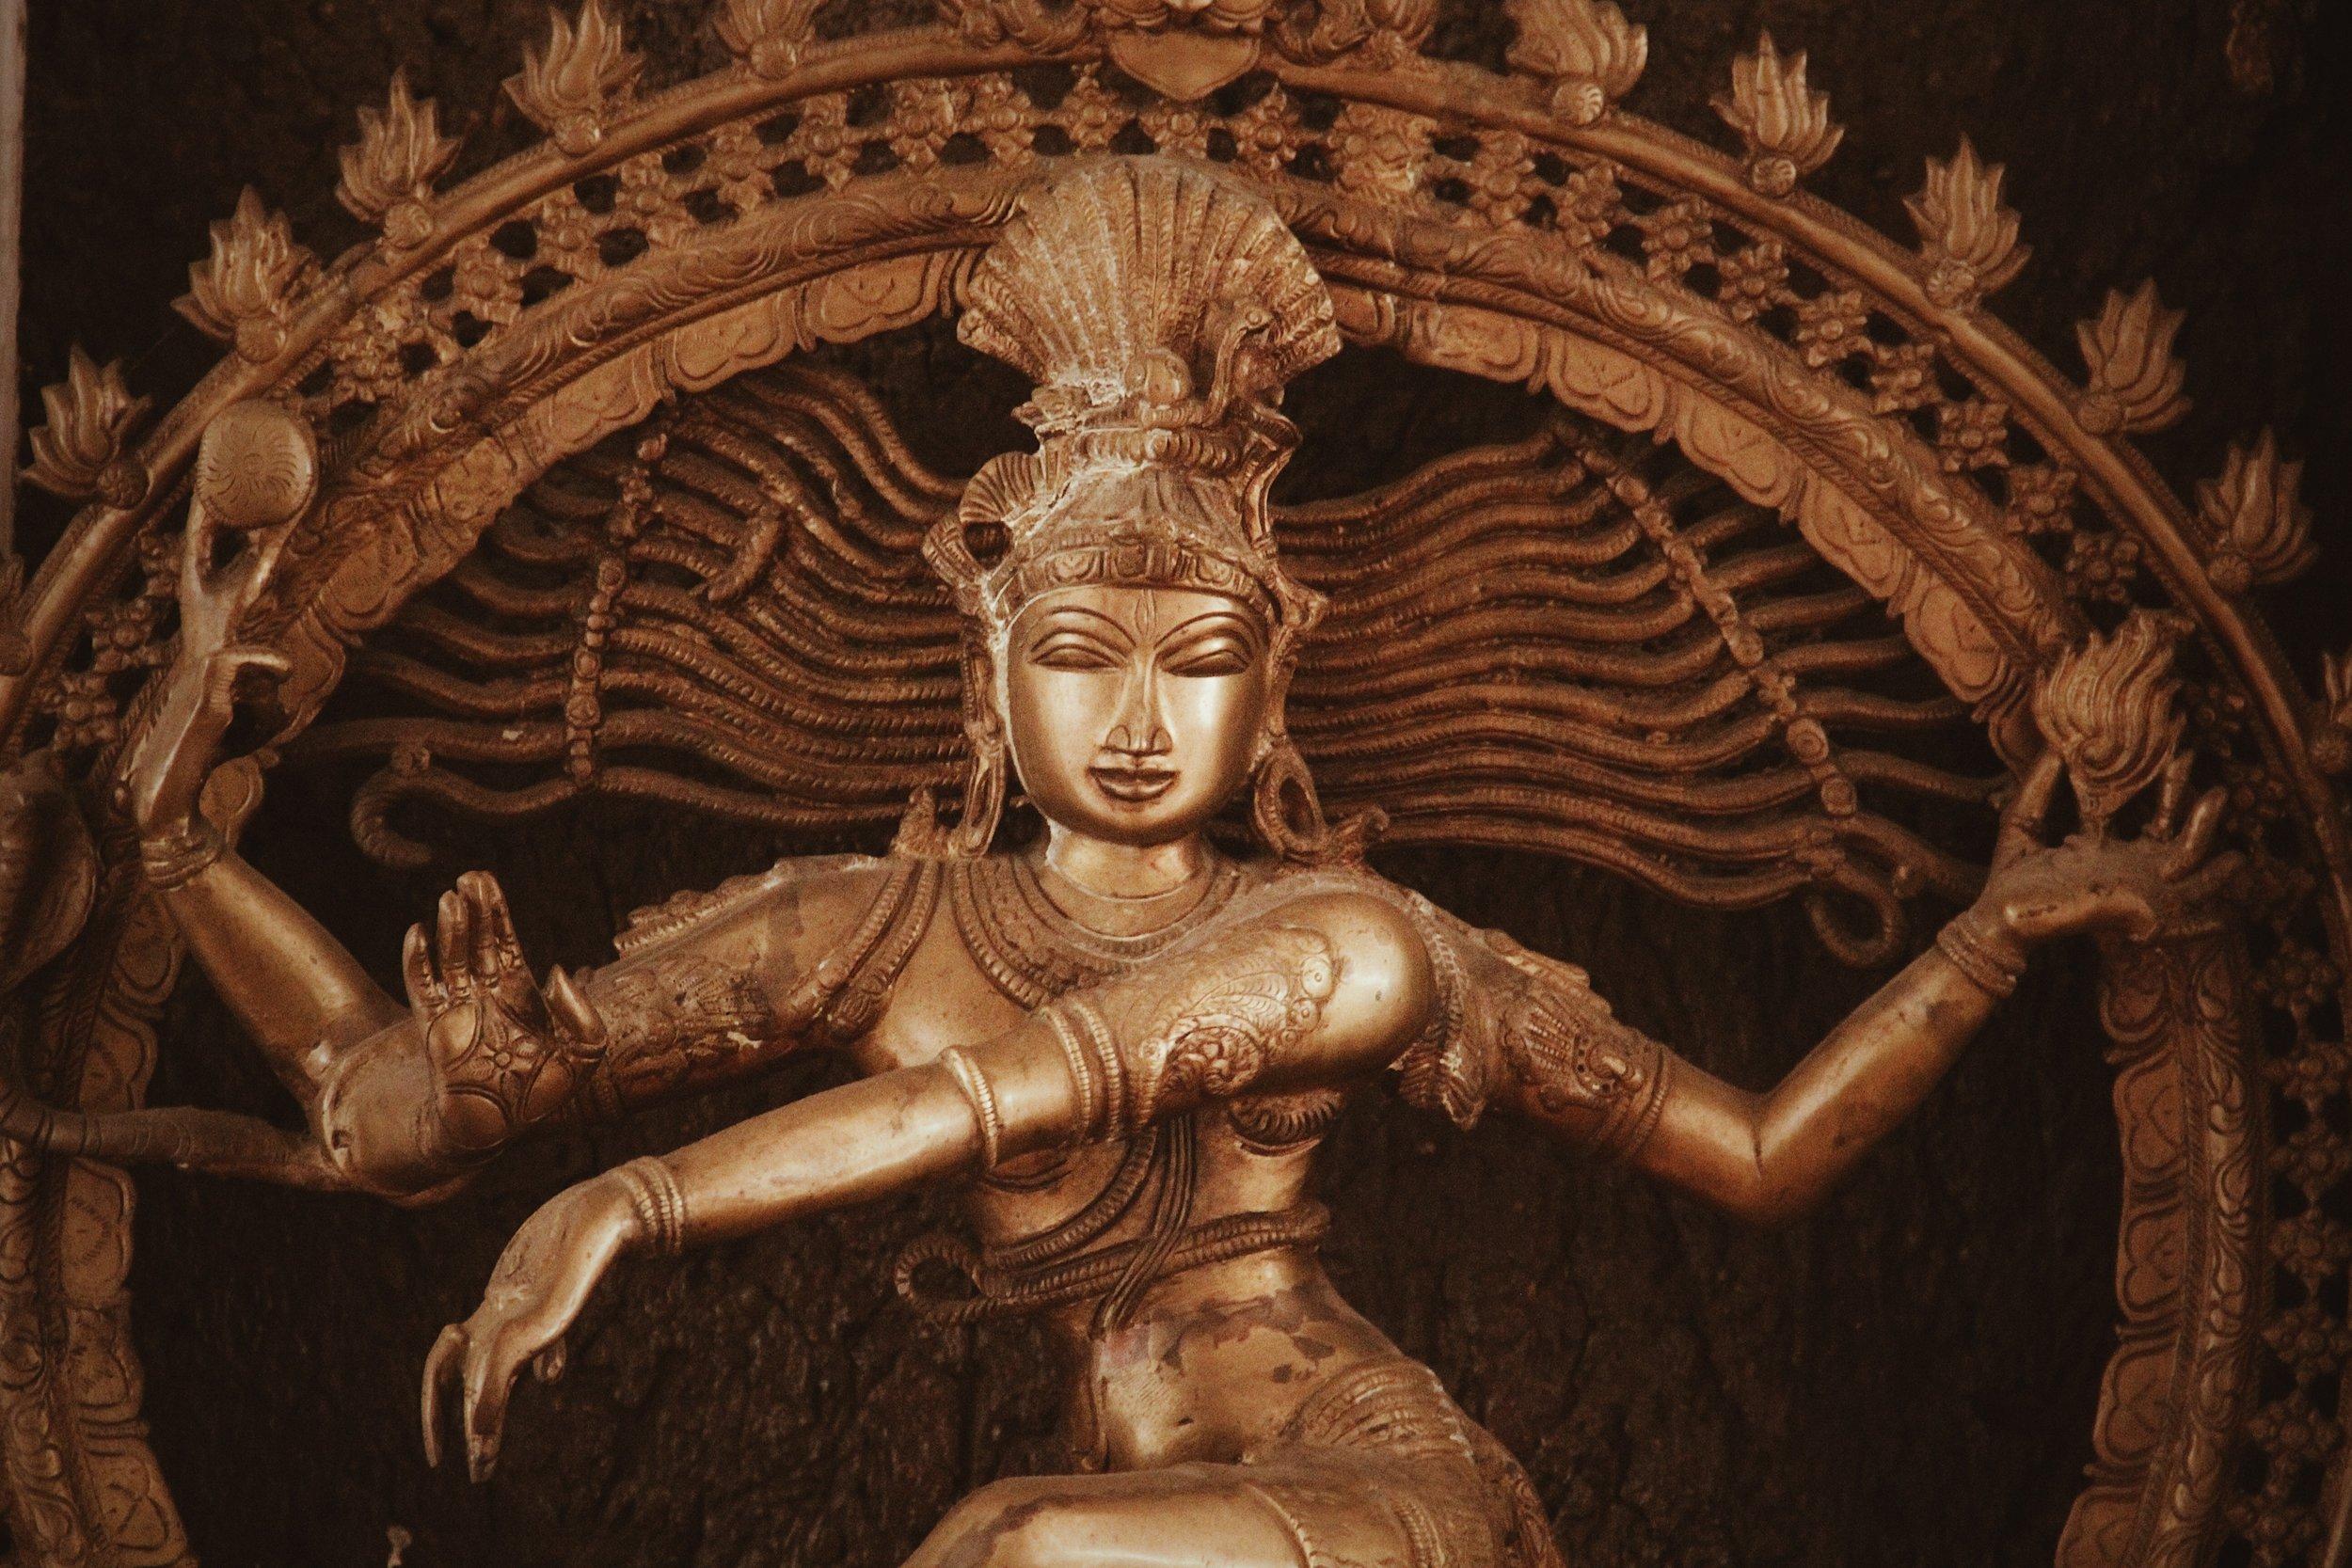 Mudras Hindu Deities Gestures